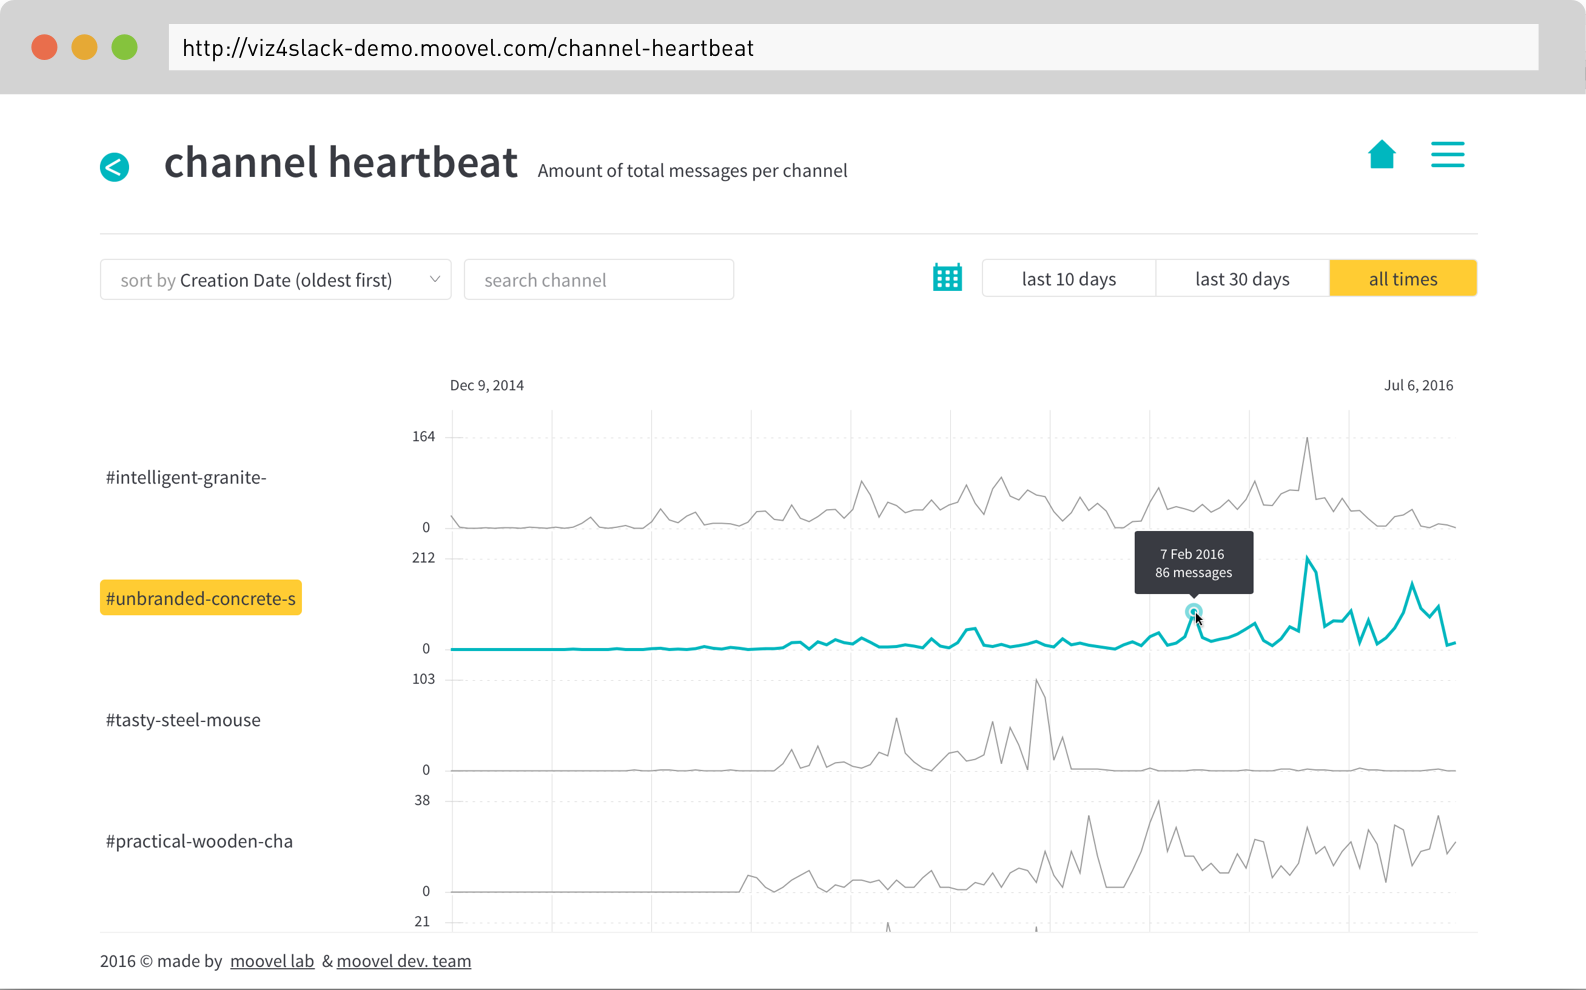 Screenshot of  the channel heartbeat in #teamchatviz